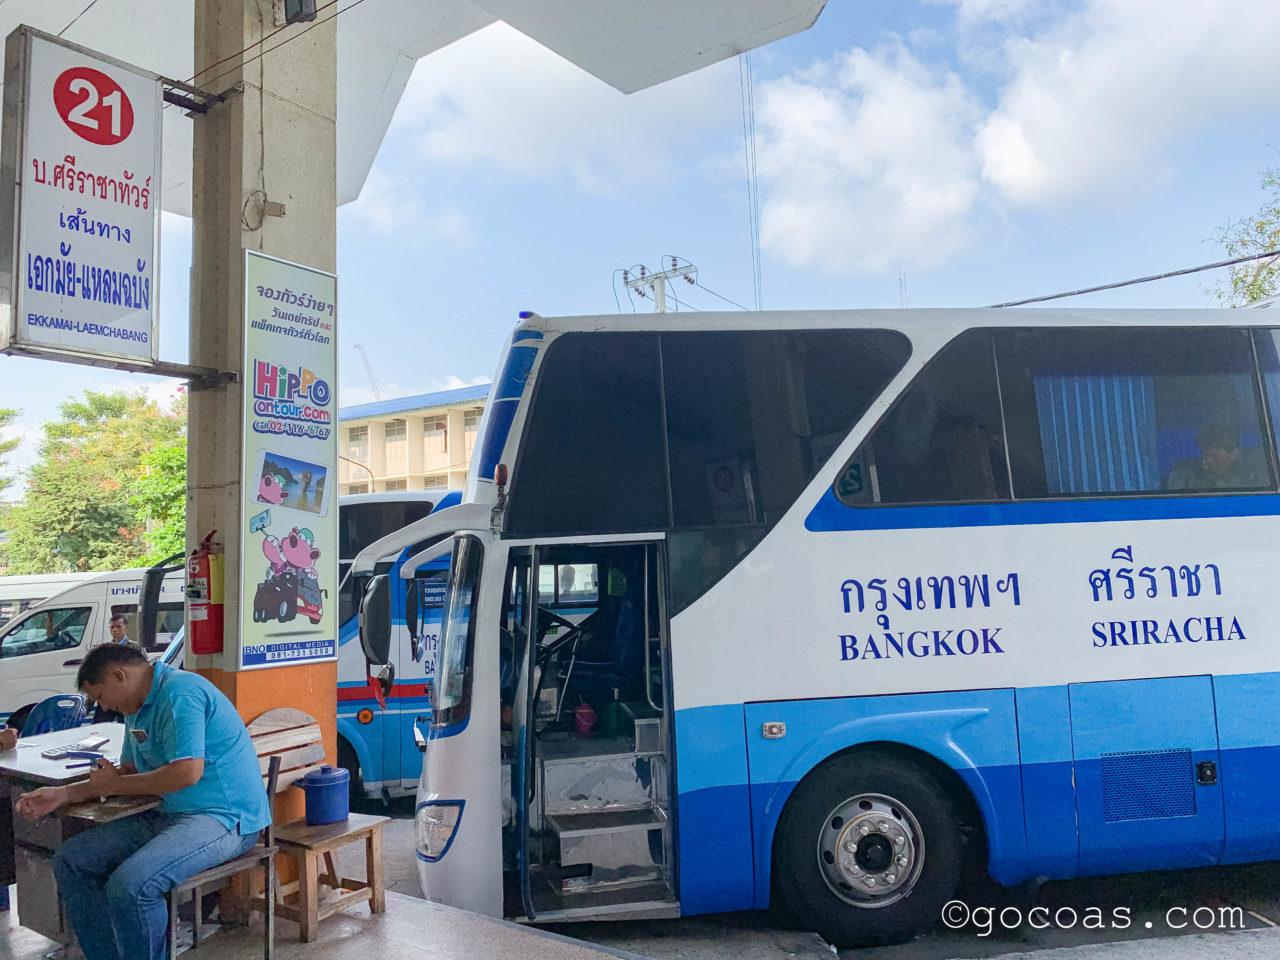 Bangkok Bus Terminal21番バス停とこれから乗るバス